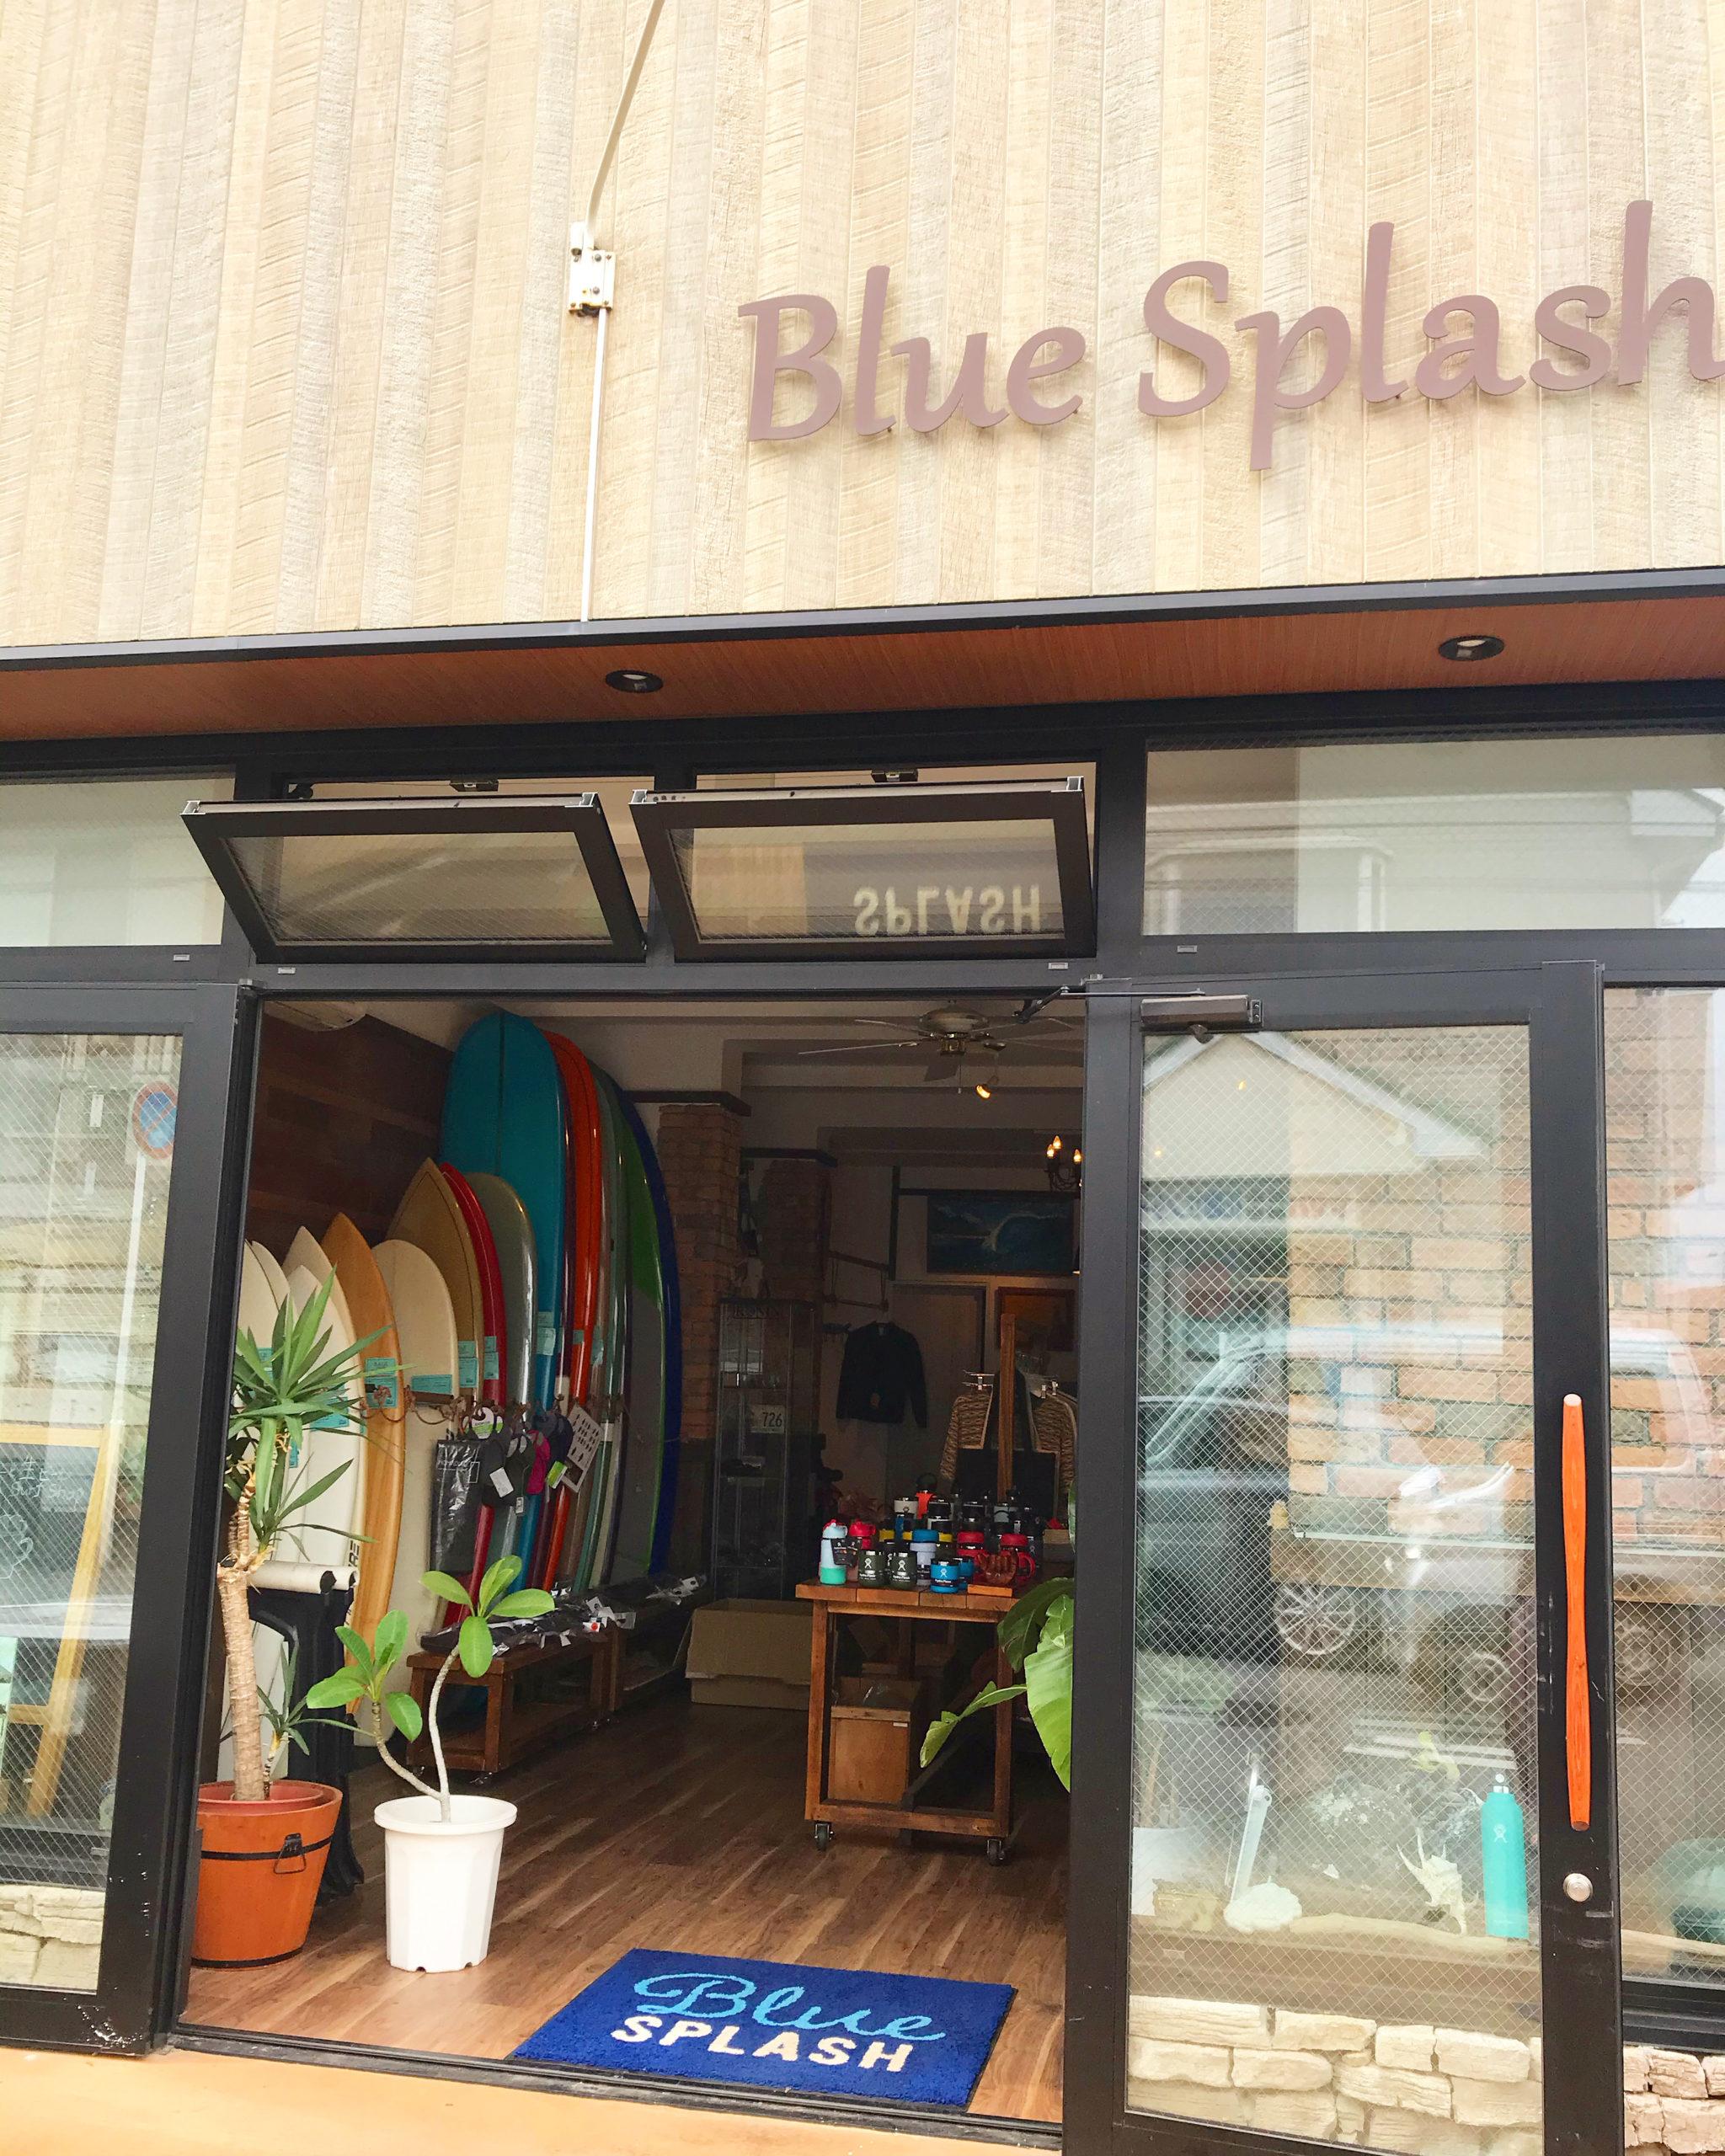 Blue Splash (ブルースプラッシュ)